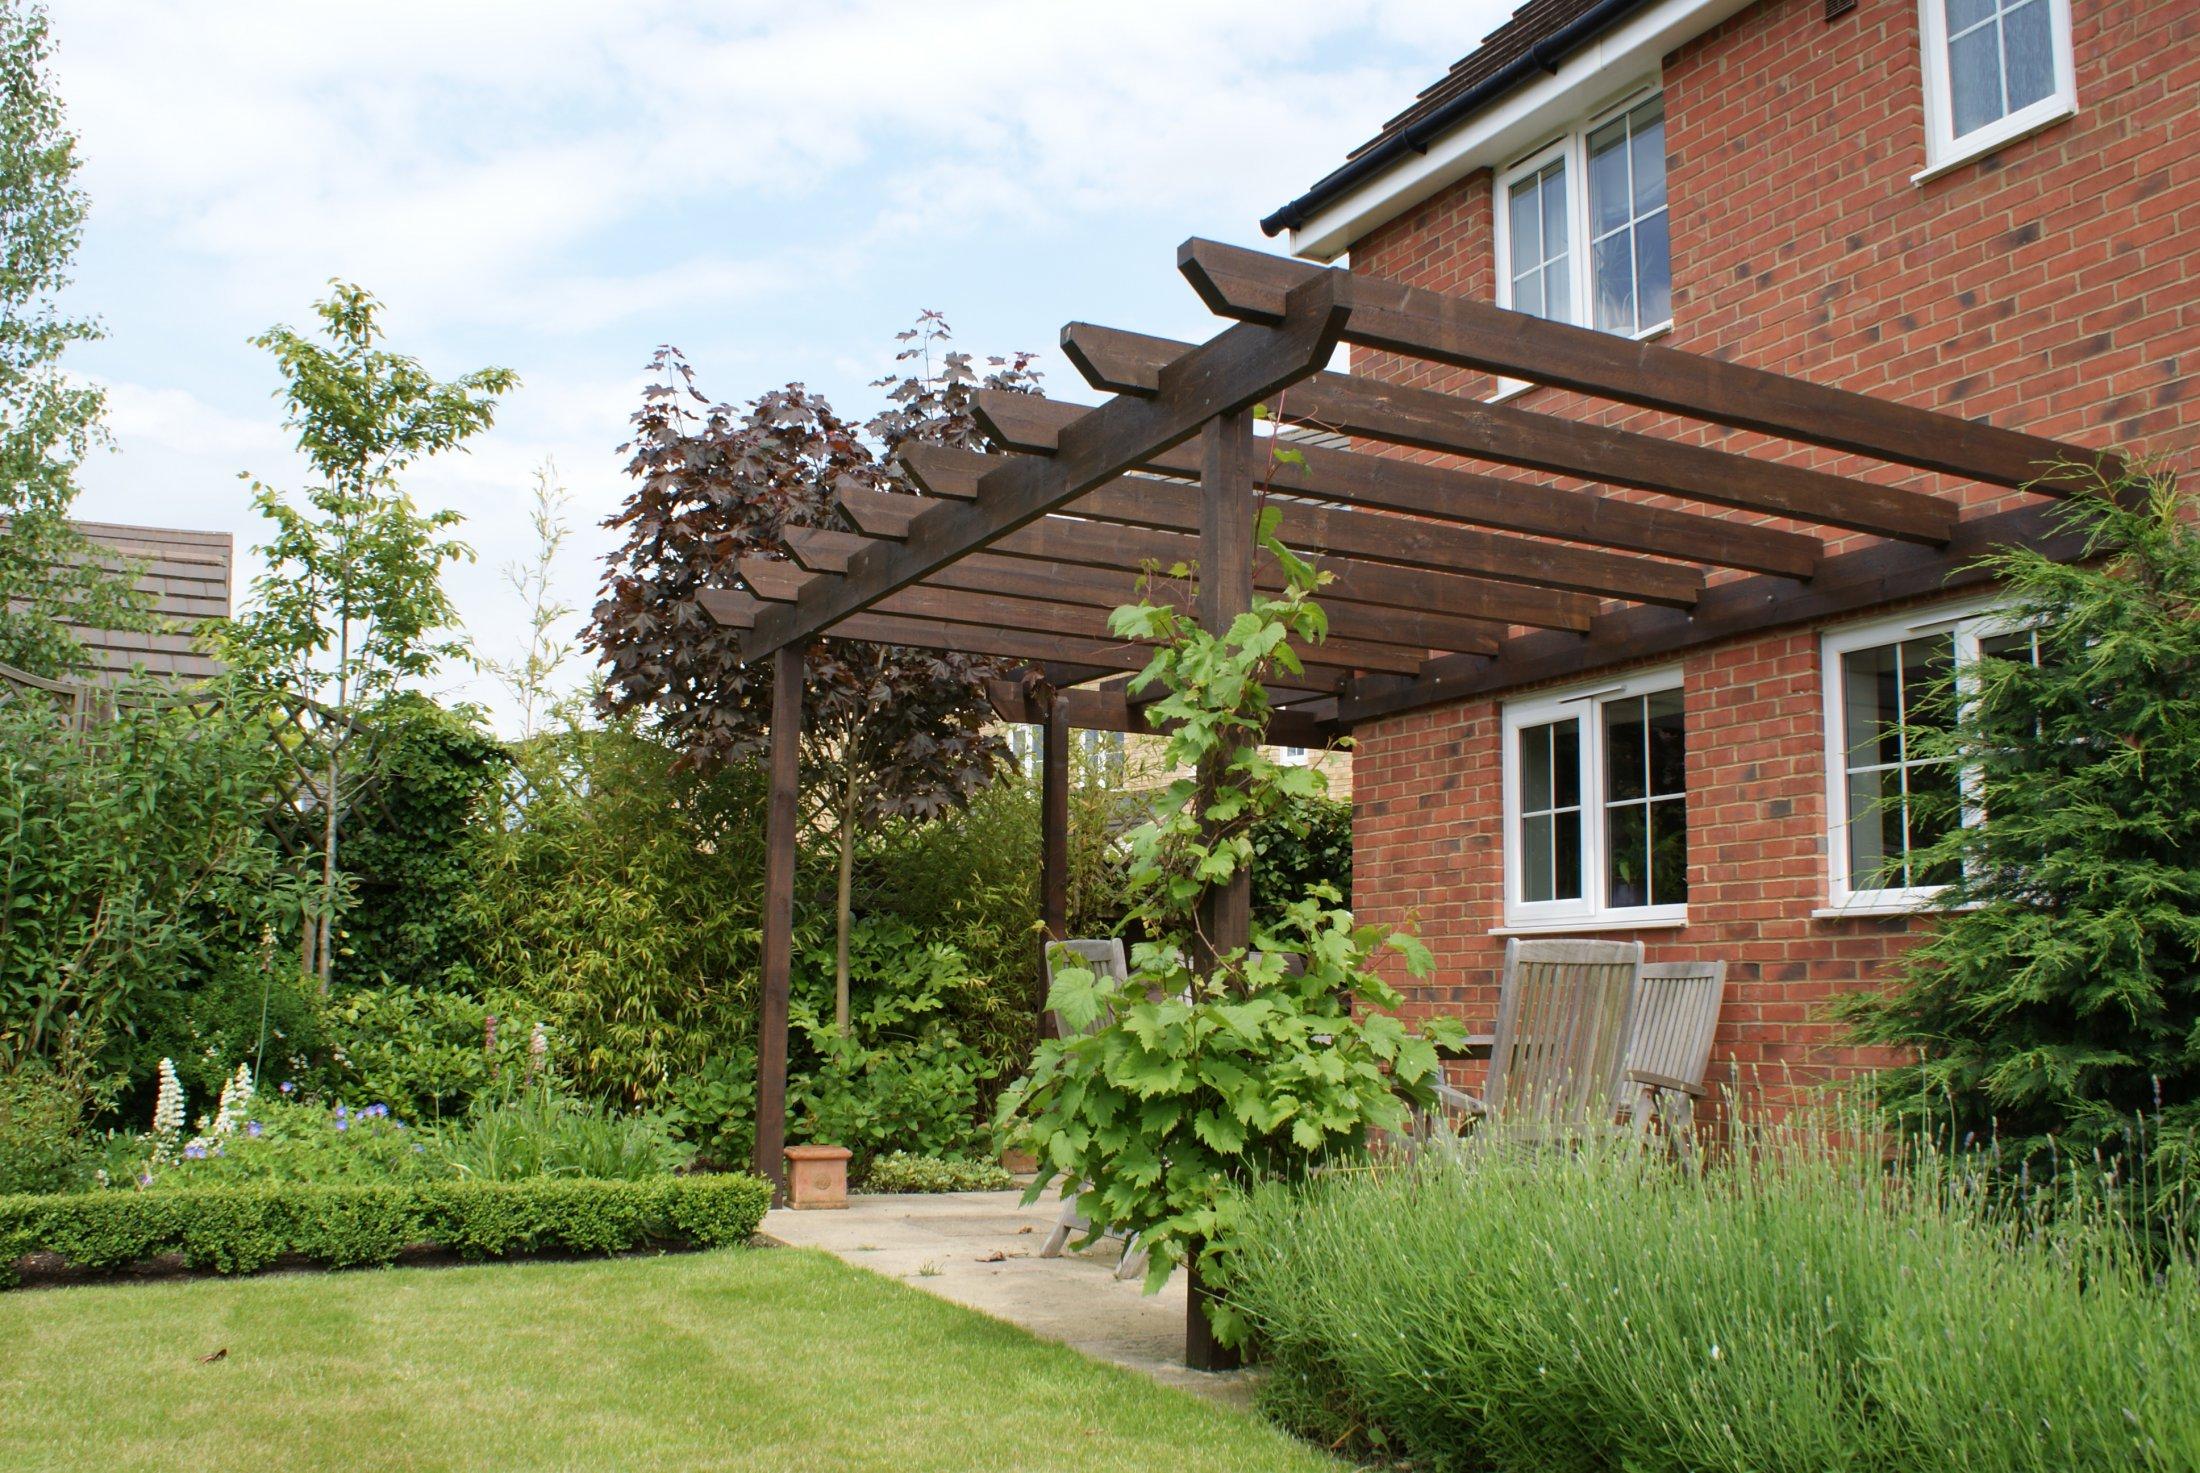 Bespoke garden pergola in Cambourne, Cambridgeshire